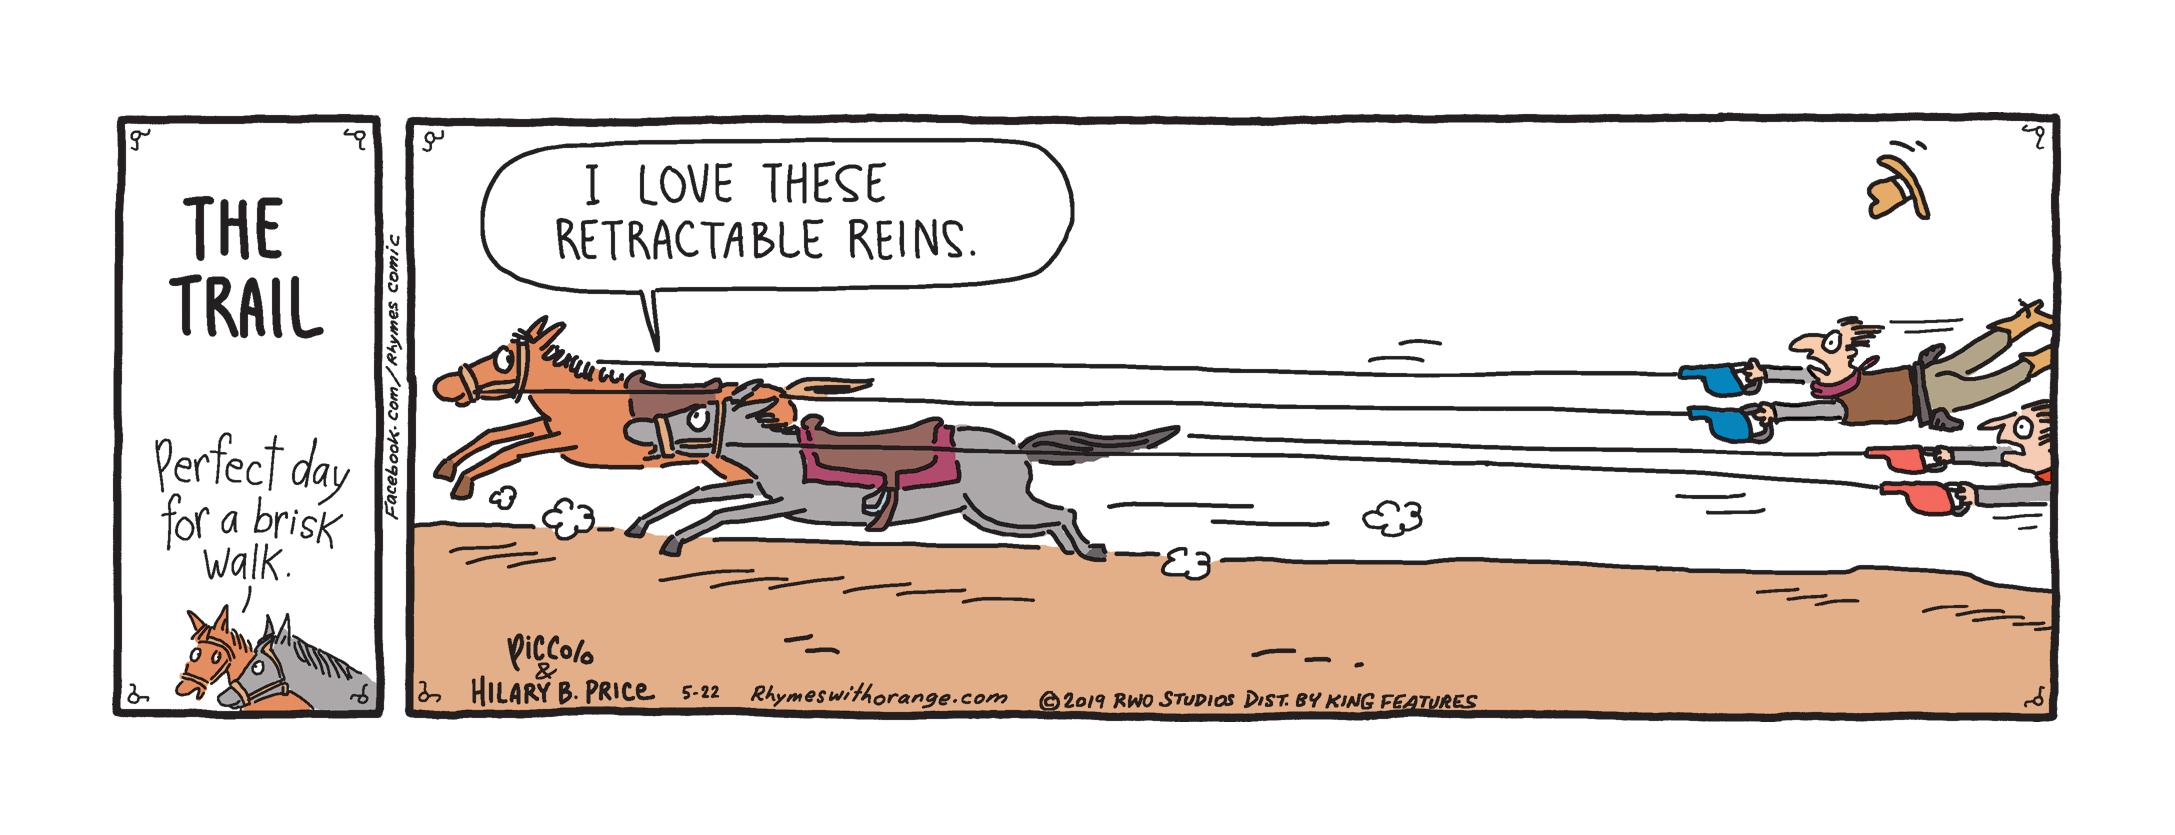 retractable reins.jpg